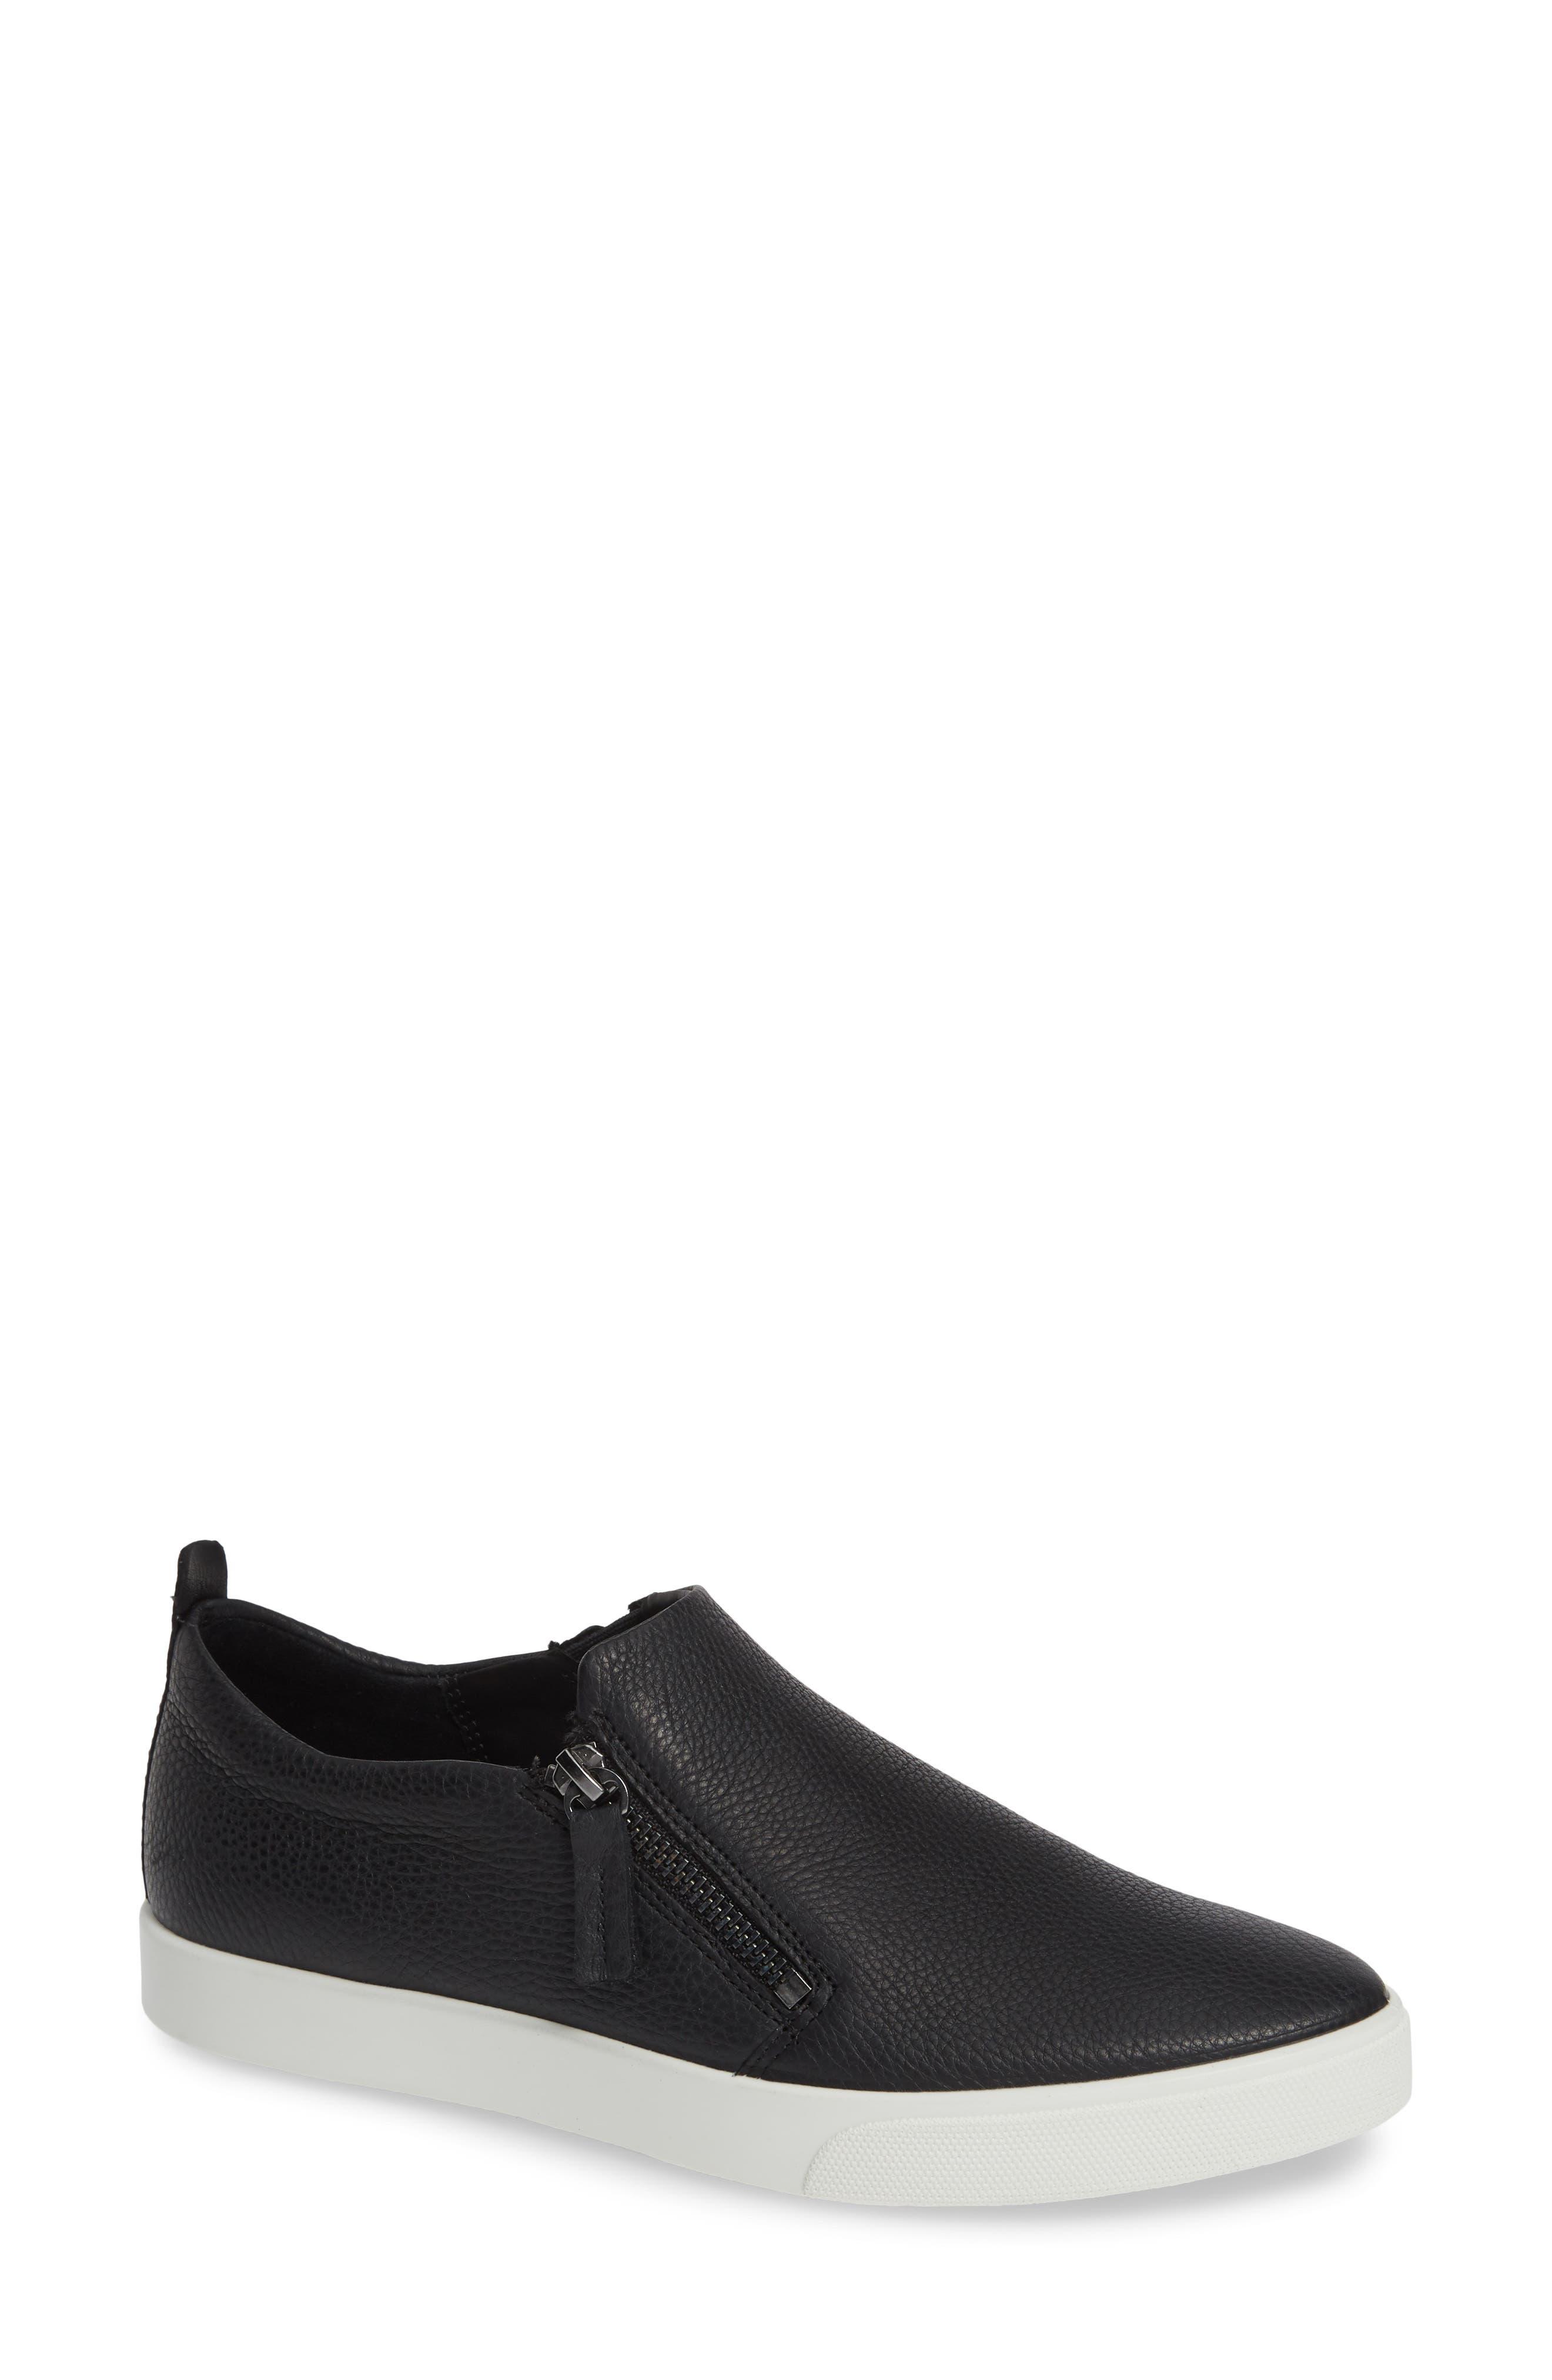 Ecco Gillian Side Zip Sneaker, Black